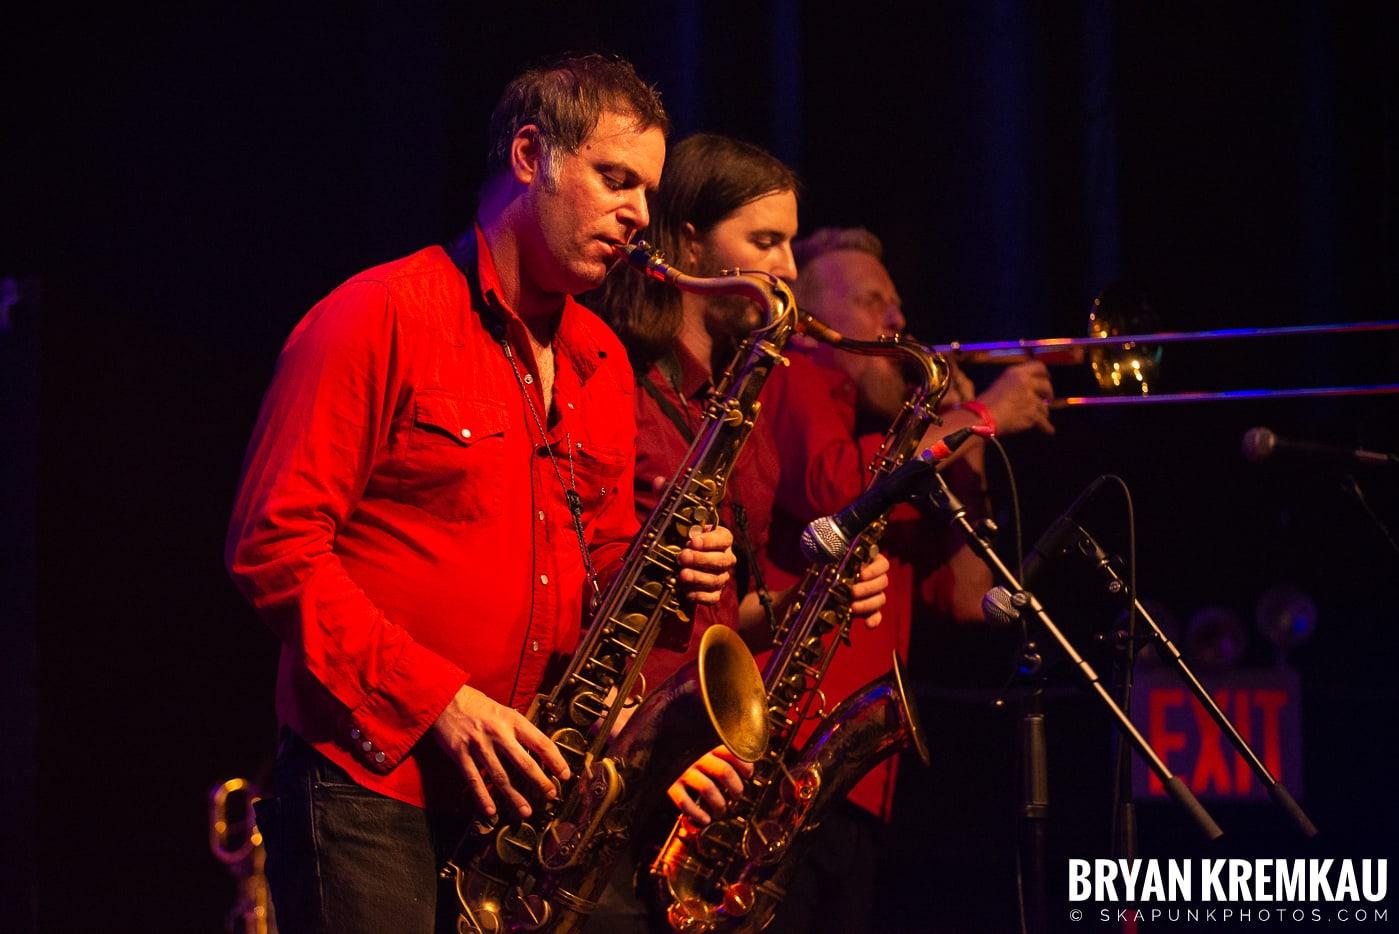 Spring Heeled Jack @ Radicsfest, Gramercy Theatre, NYC - 7.19.19 (11)